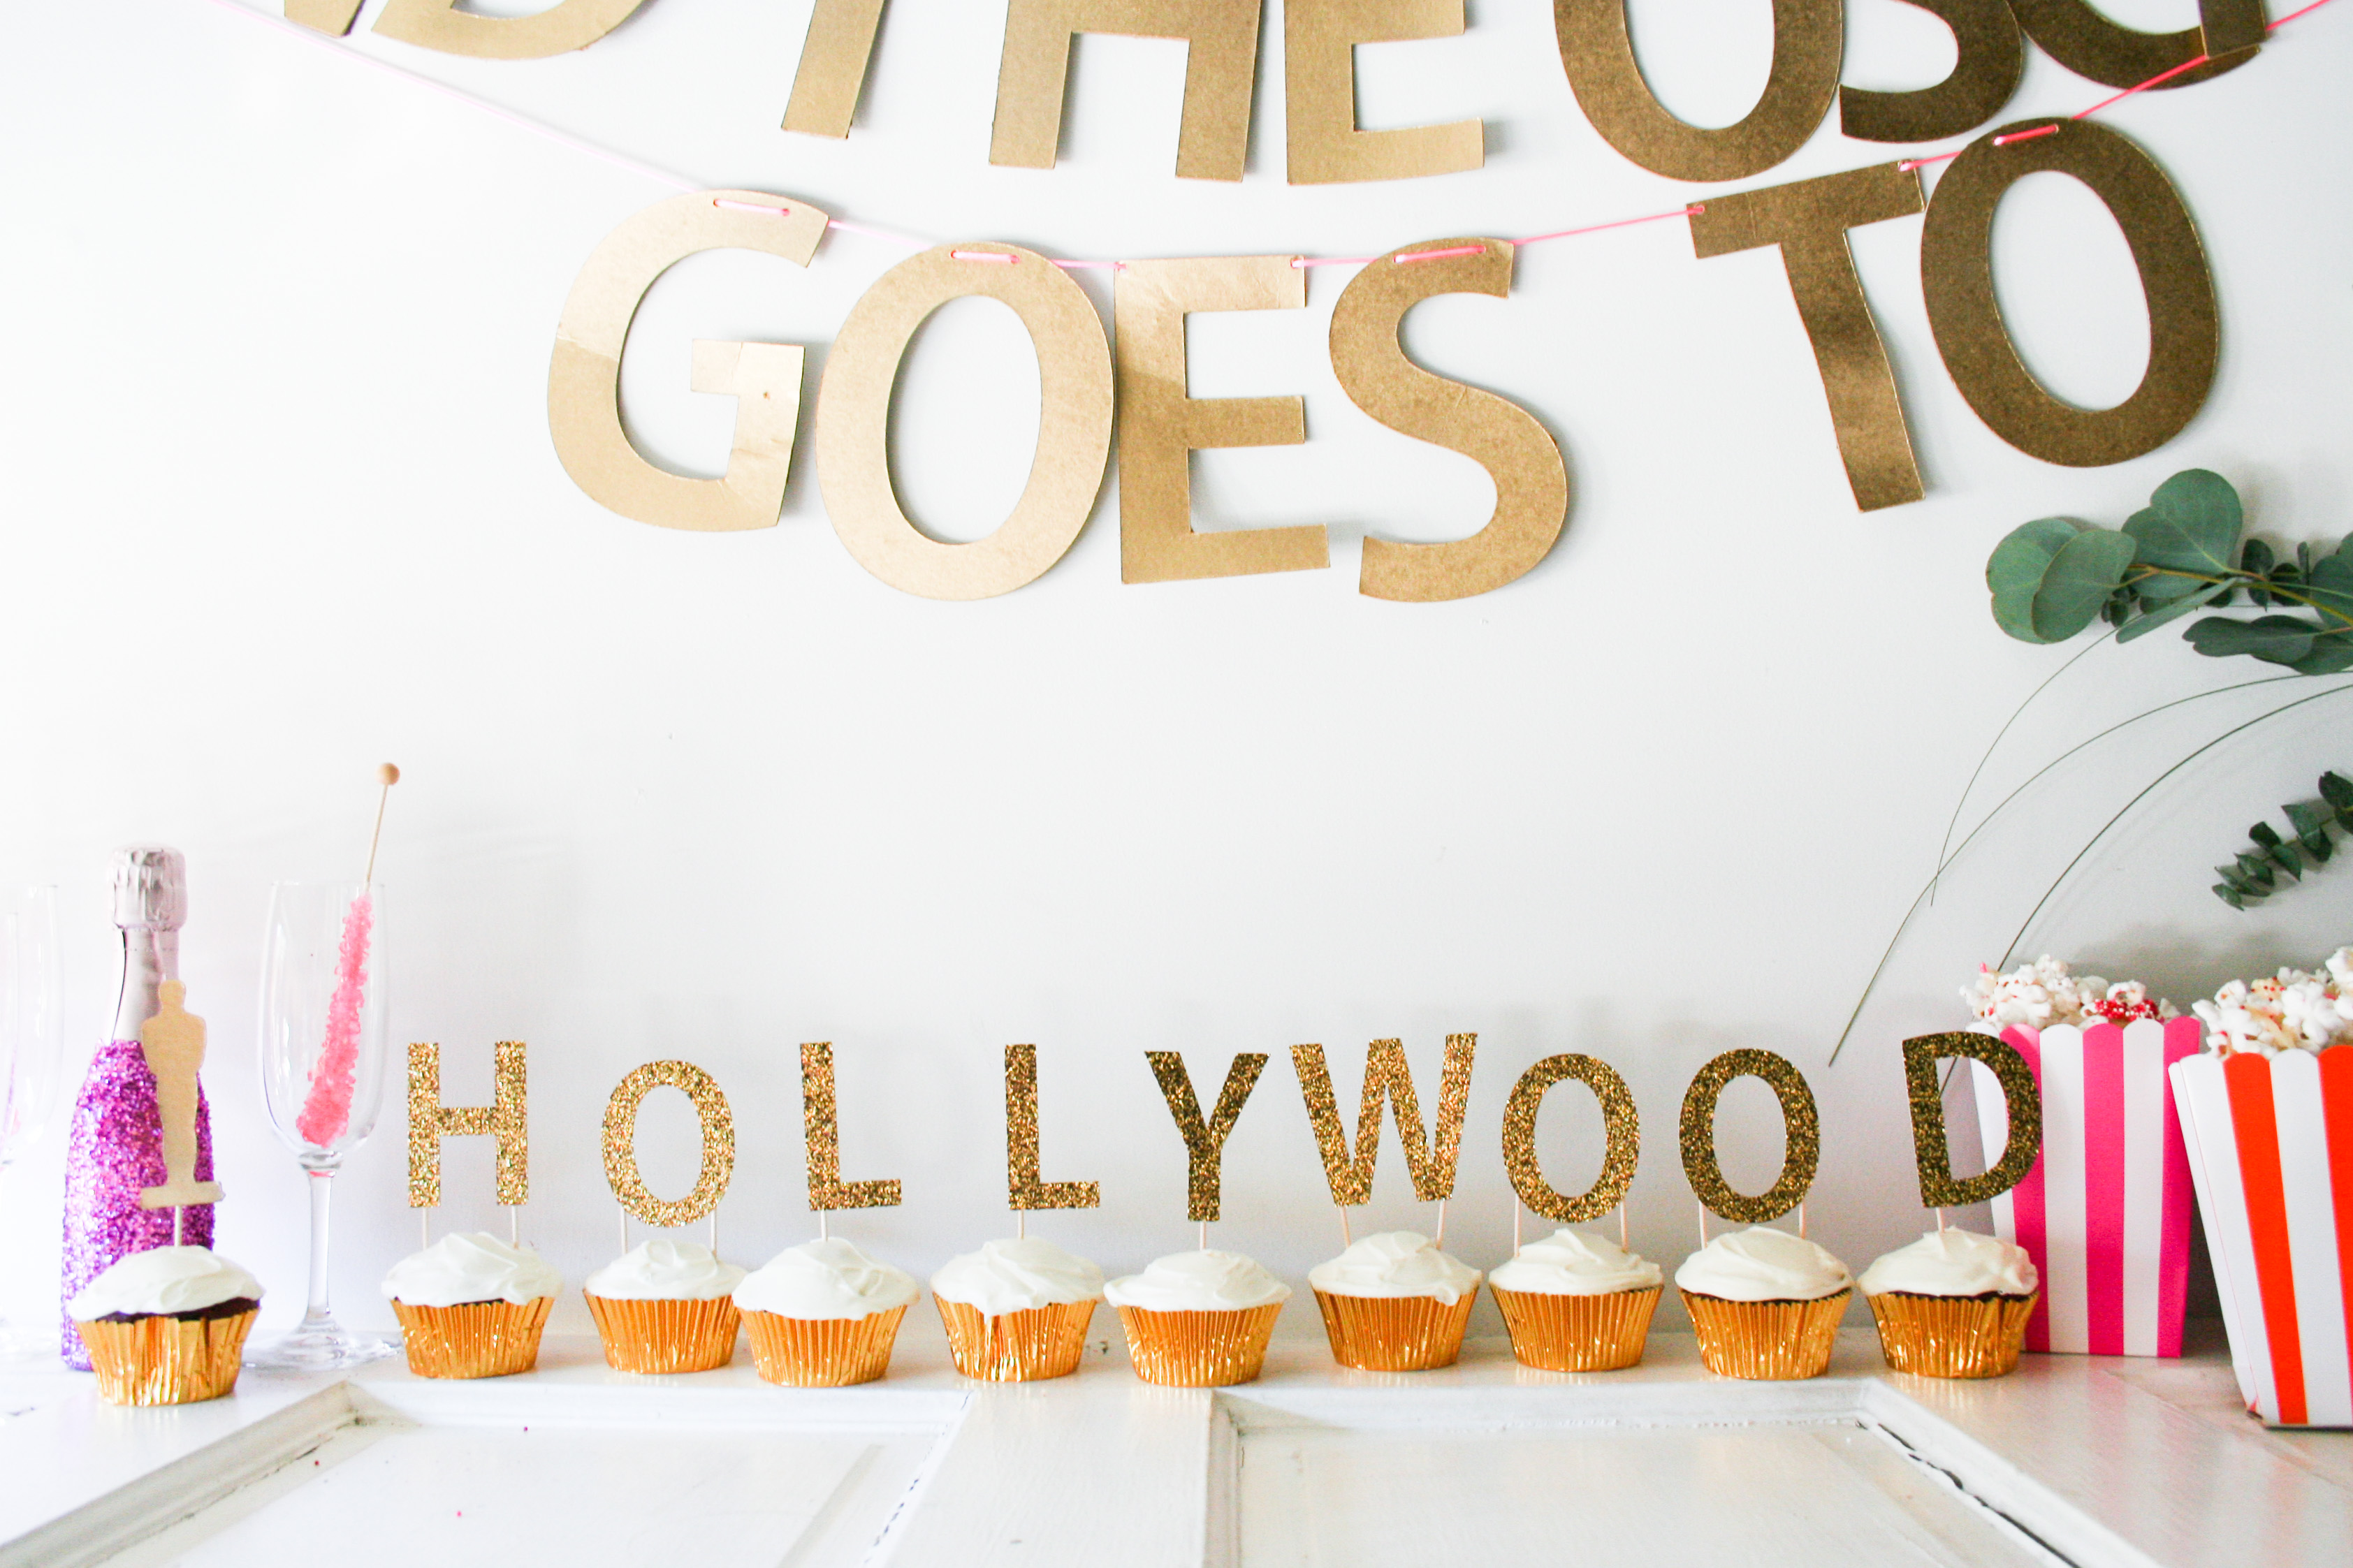 Oscar Party - Legal Miss Sunshine